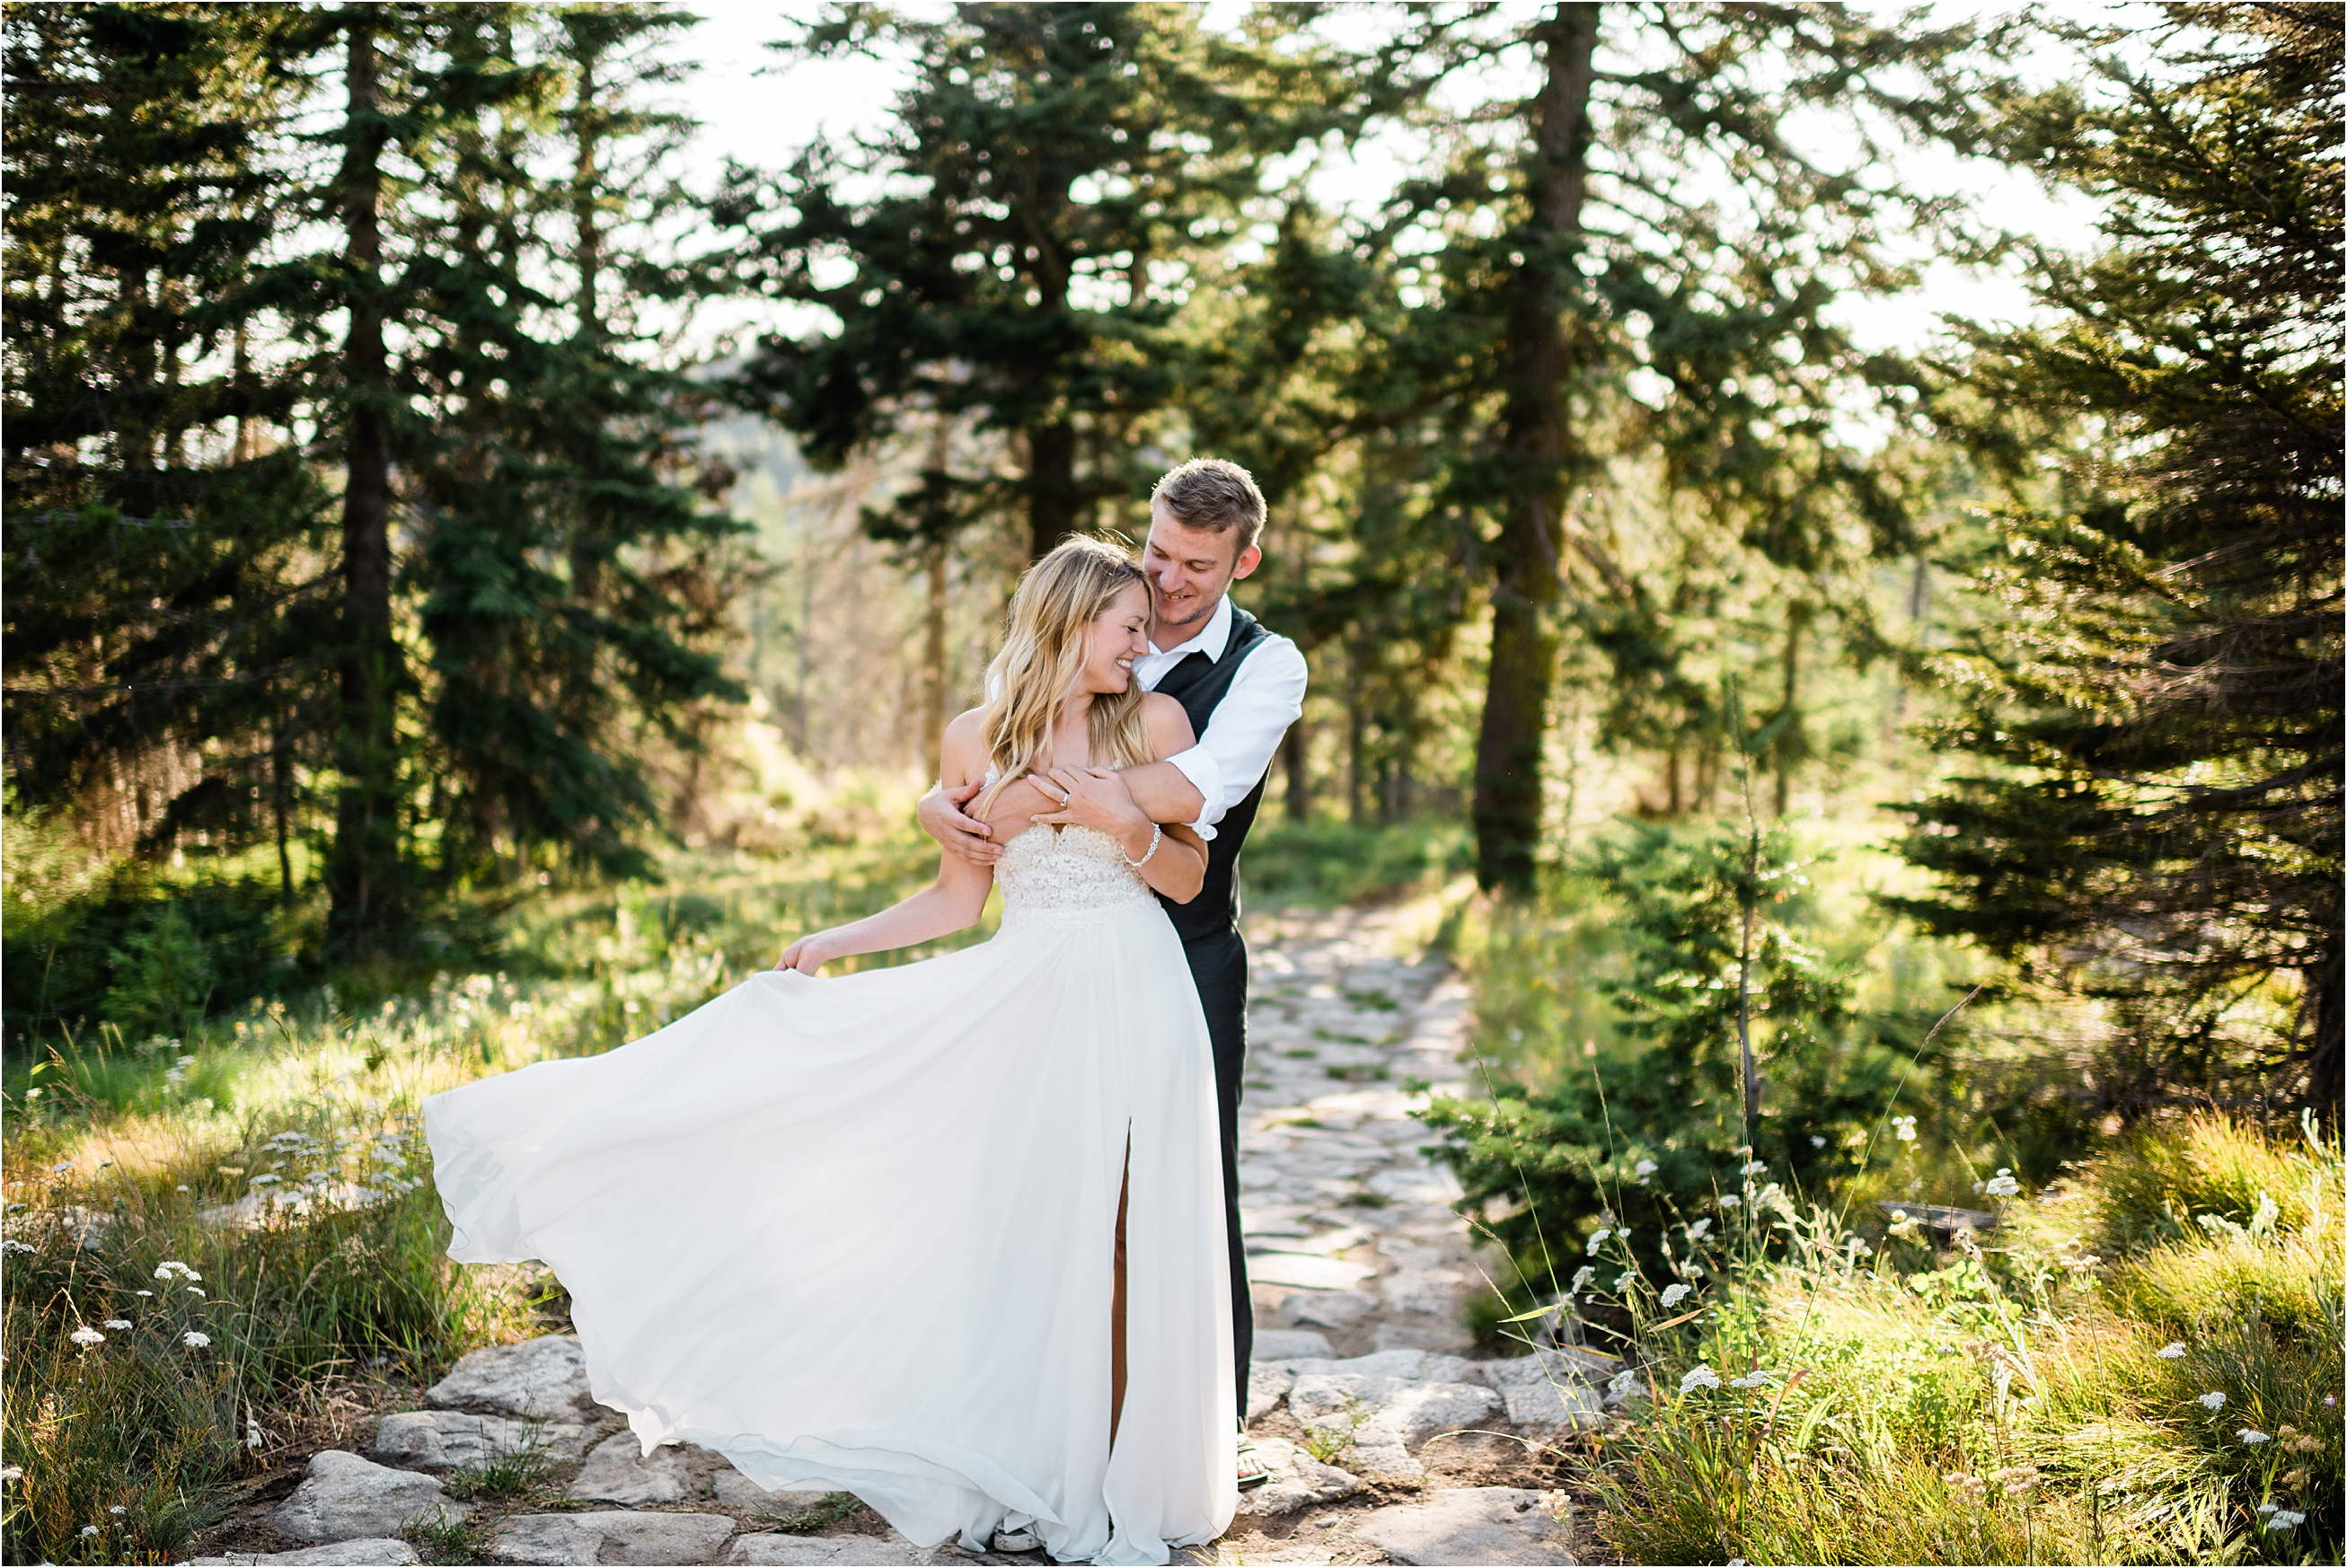 Alena & Jayden's Mt Spokane Adventure Wedding. Image by Forthright Photo.